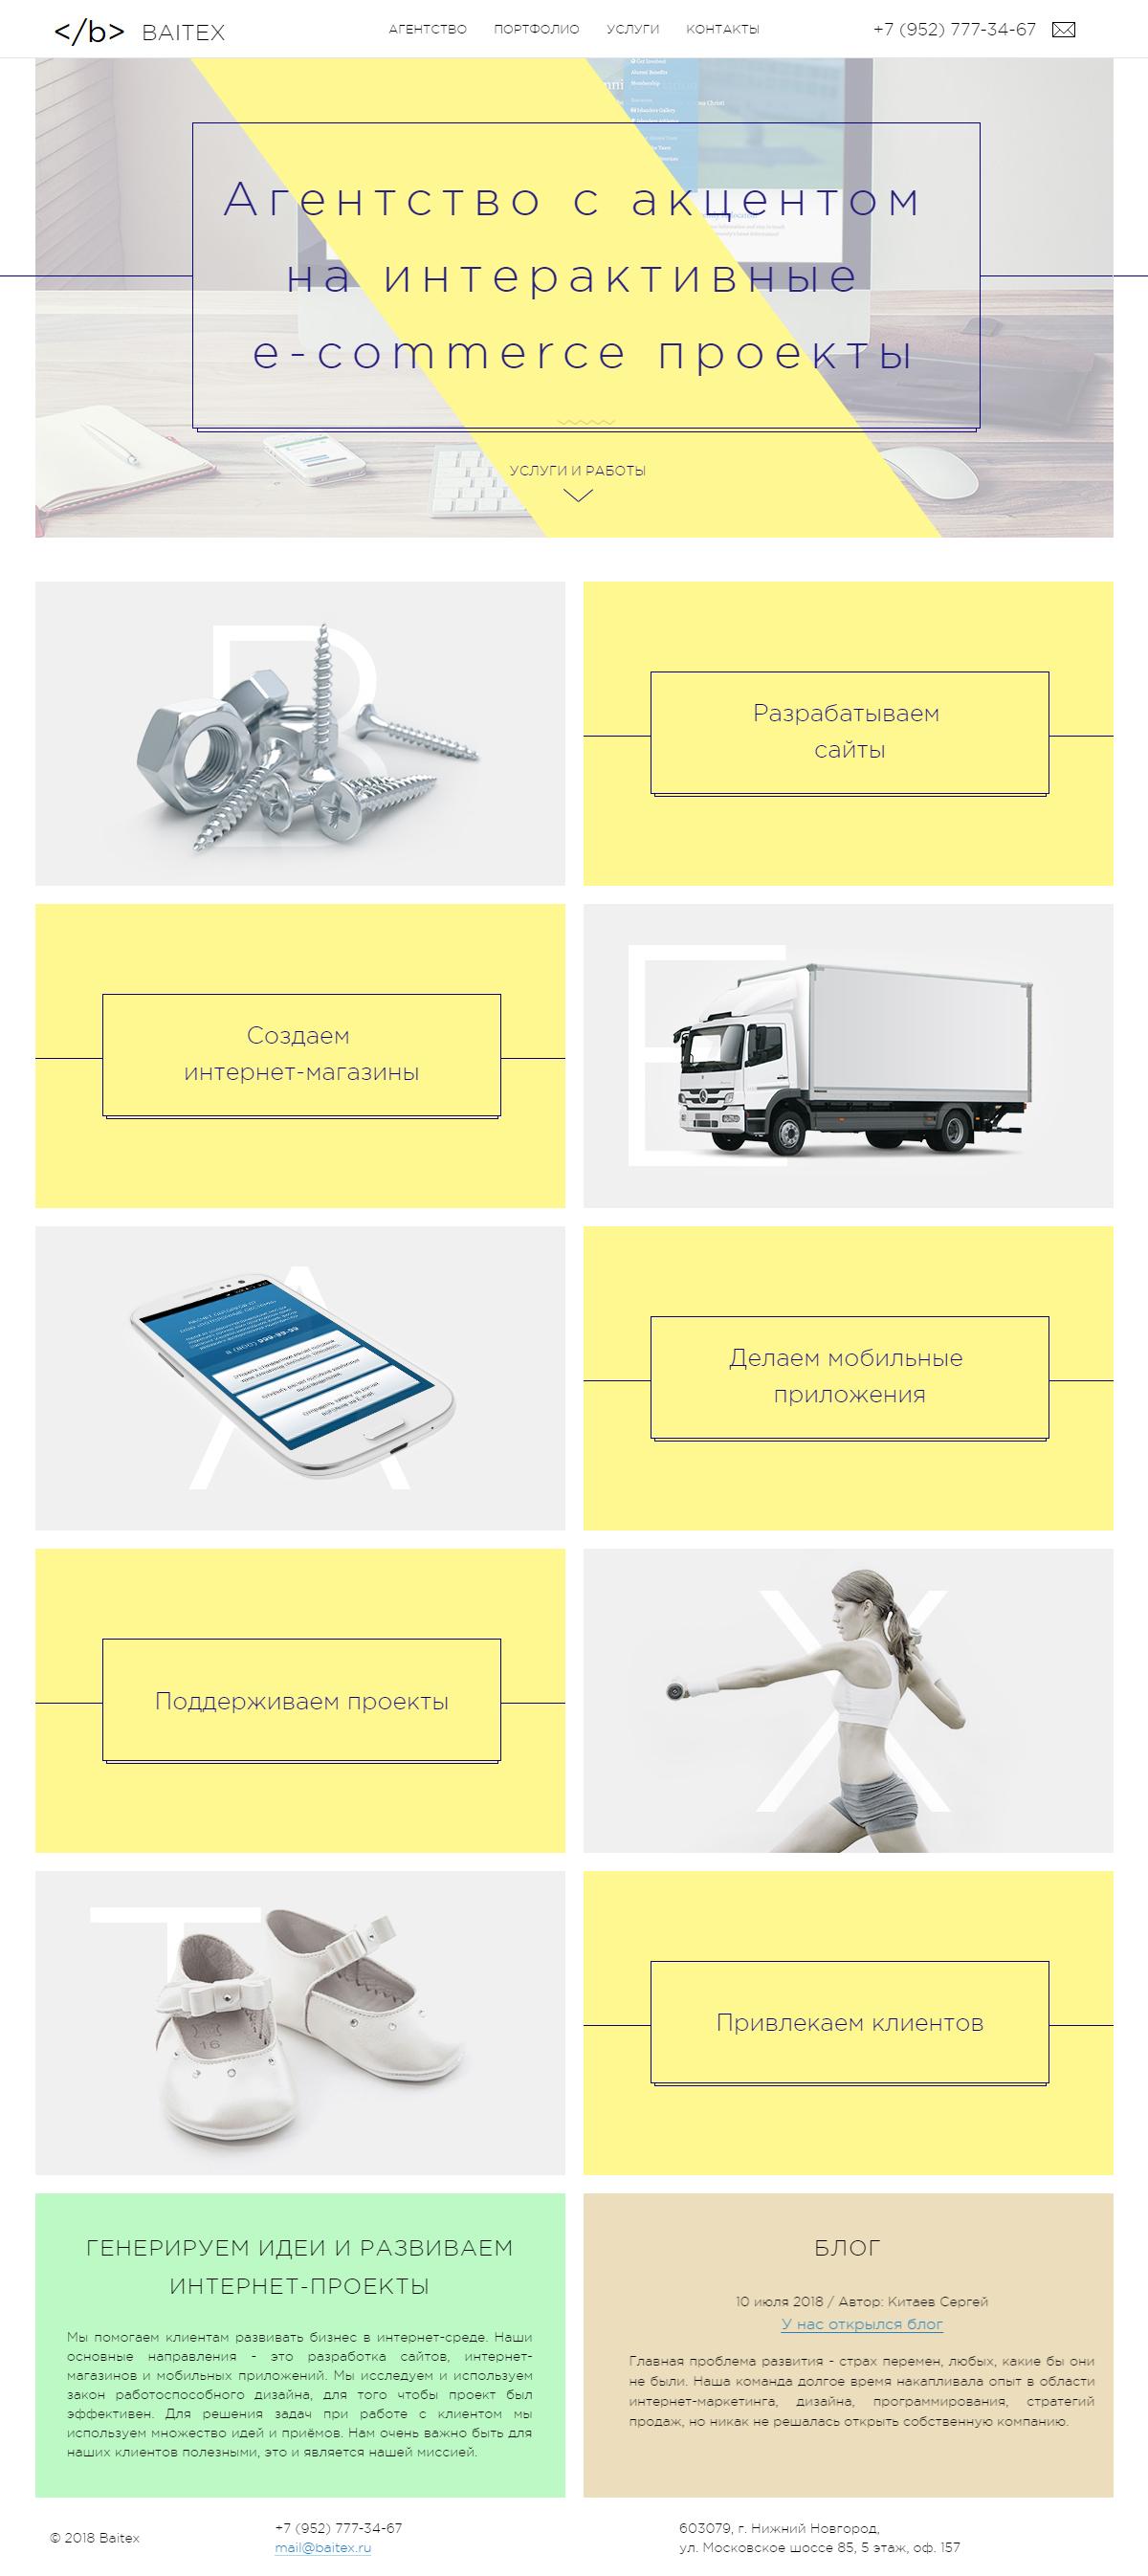 Дизайн сайта интернет-агентства «Baitex»